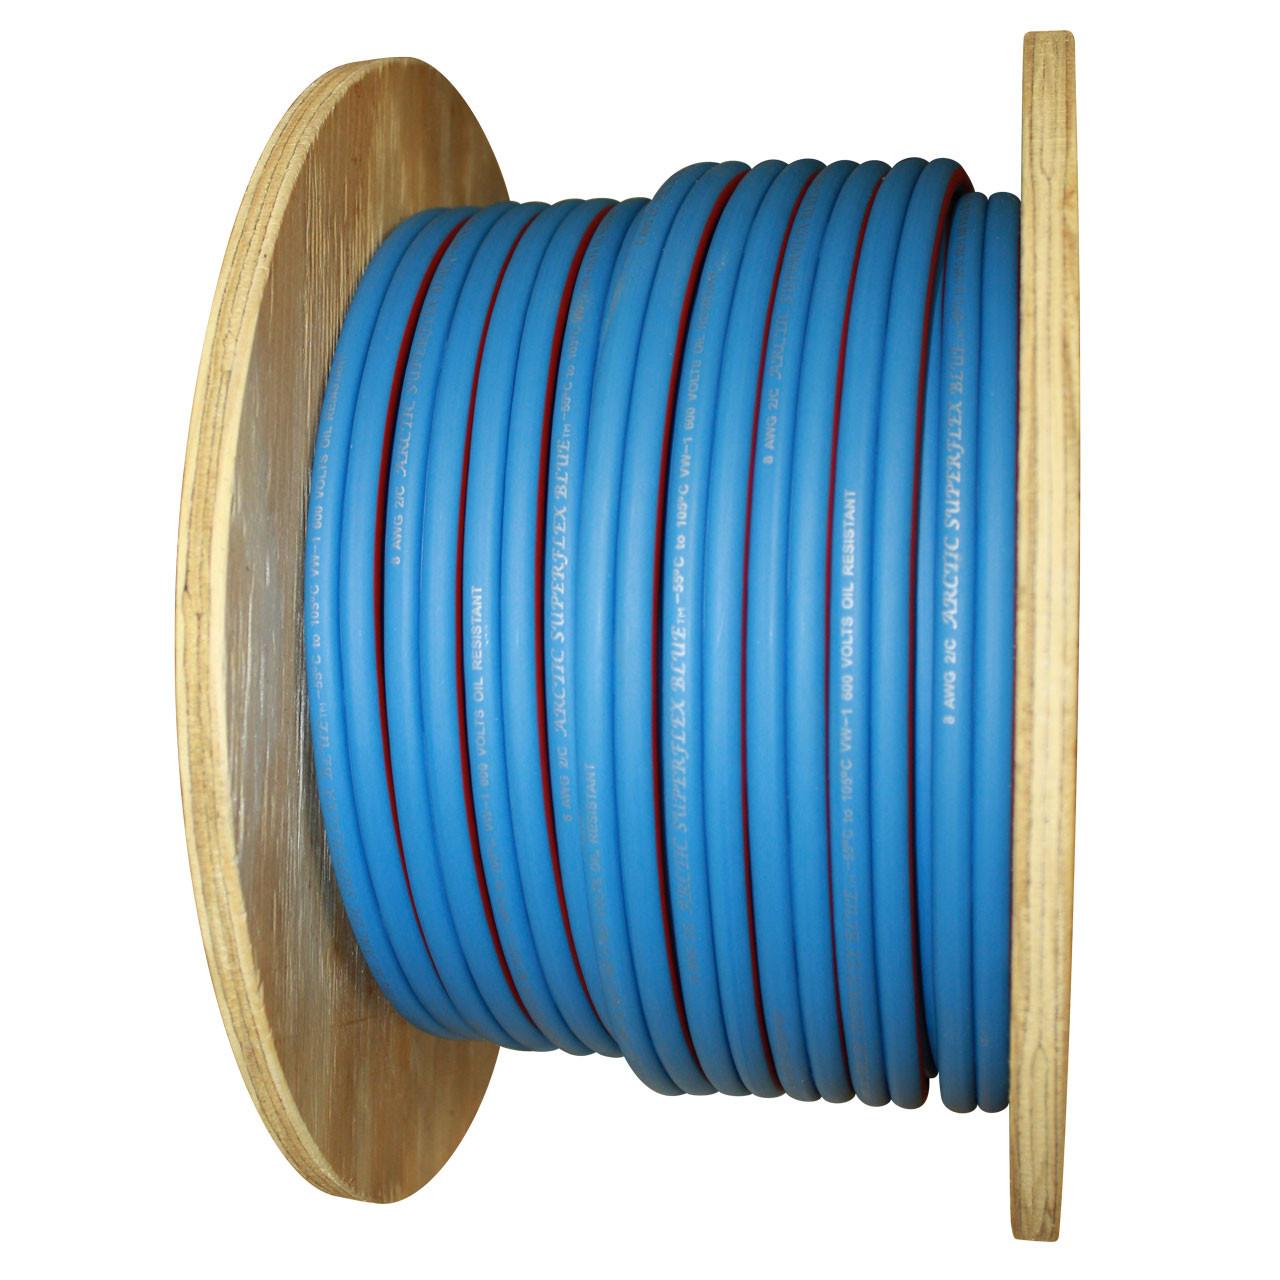 Arctic Superflex Blue 2 gauge 100% copper duplex wire - 100 foot spool